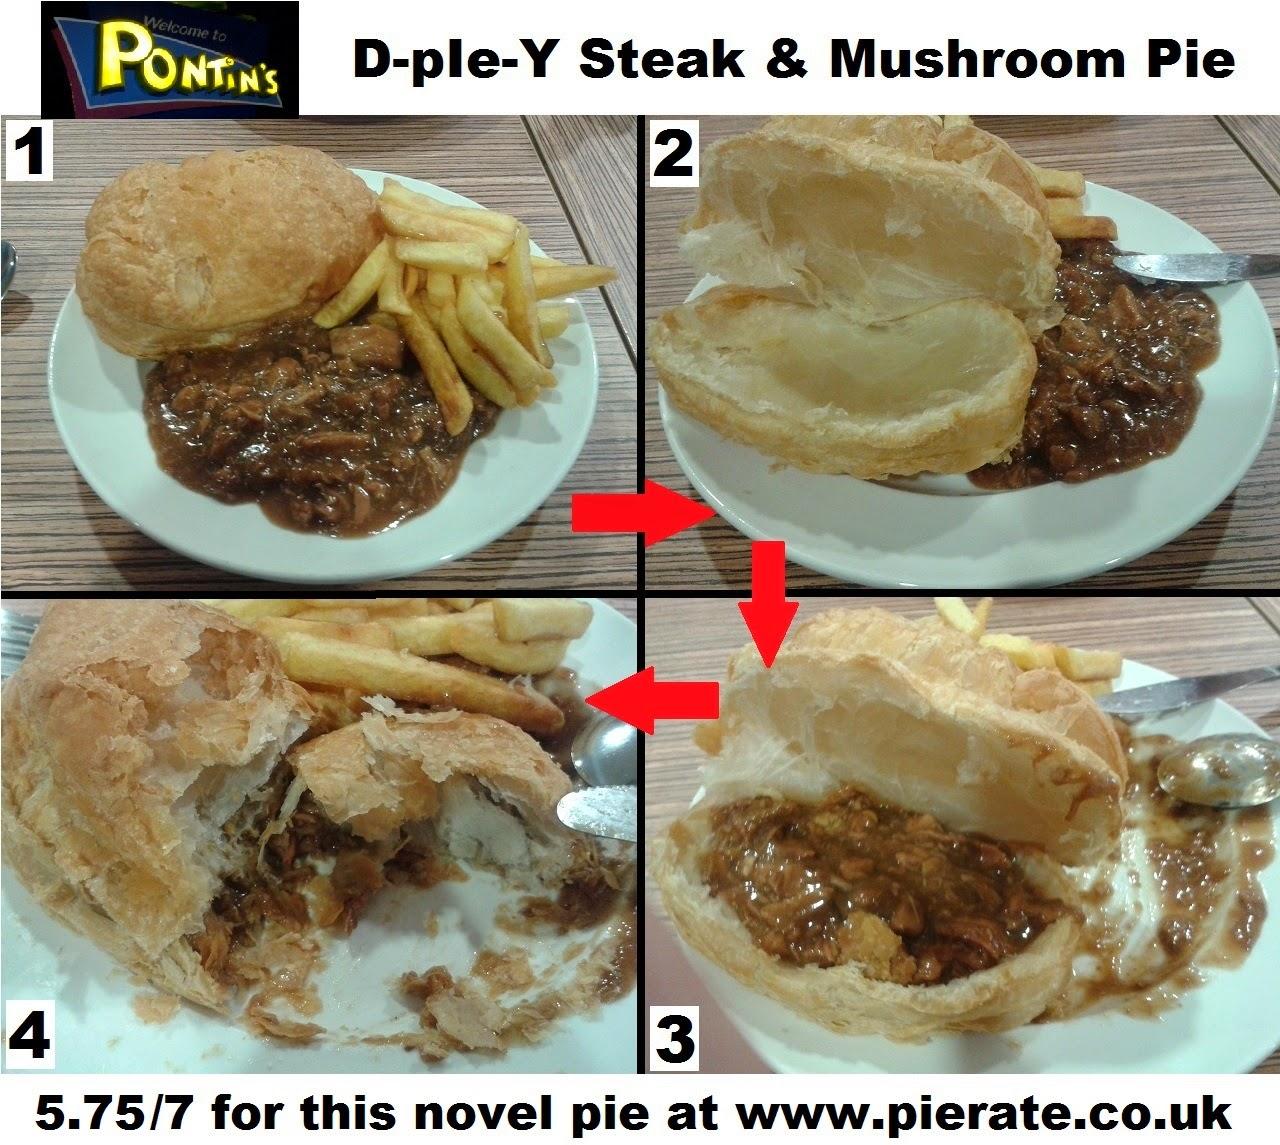 Pontins Steak Pie Review